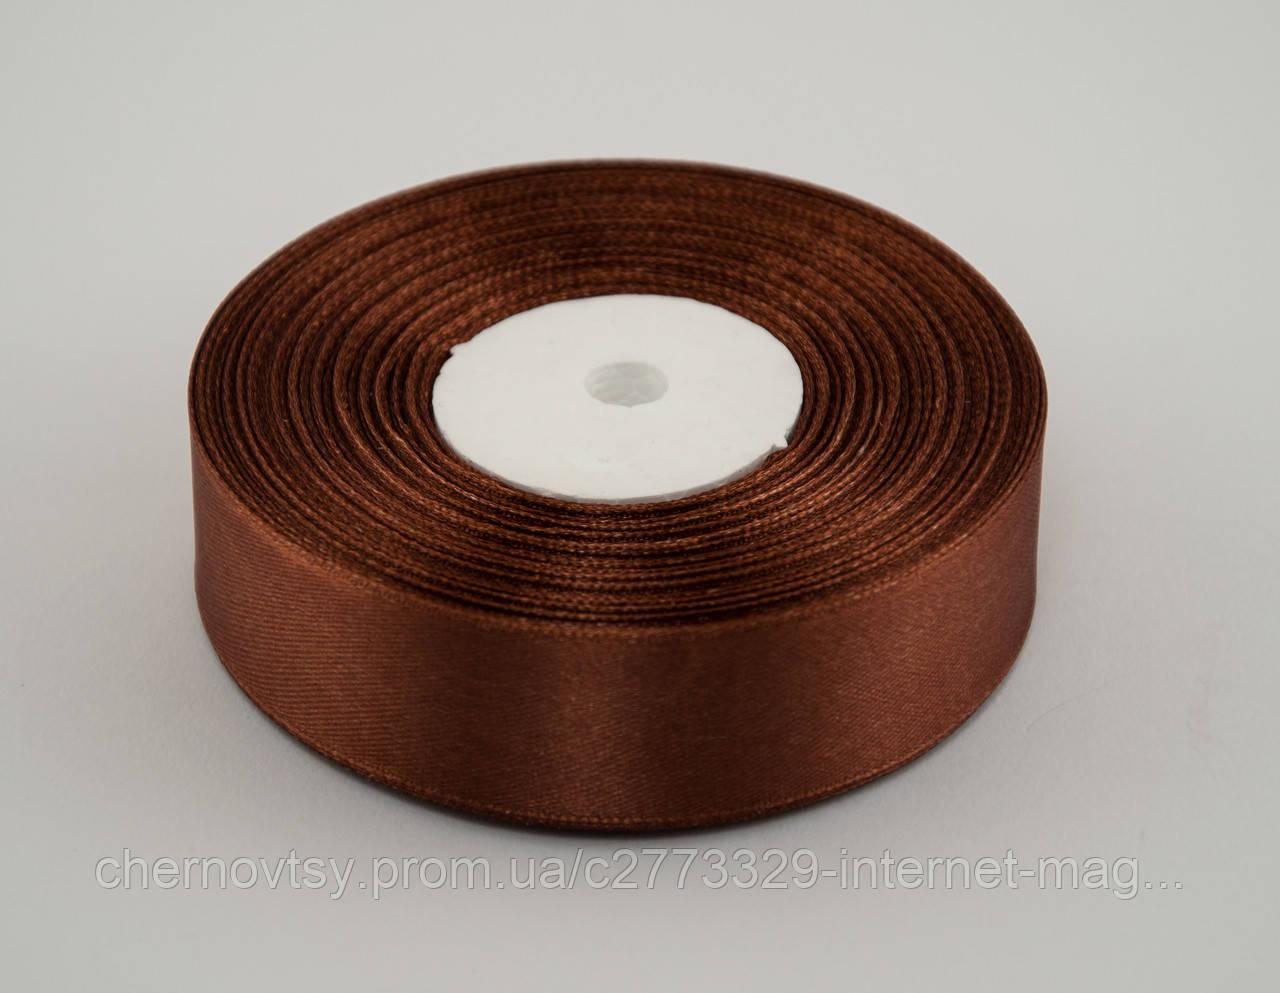 Лента атлас 1.2 см, 33 м, № 31 светло коричневая